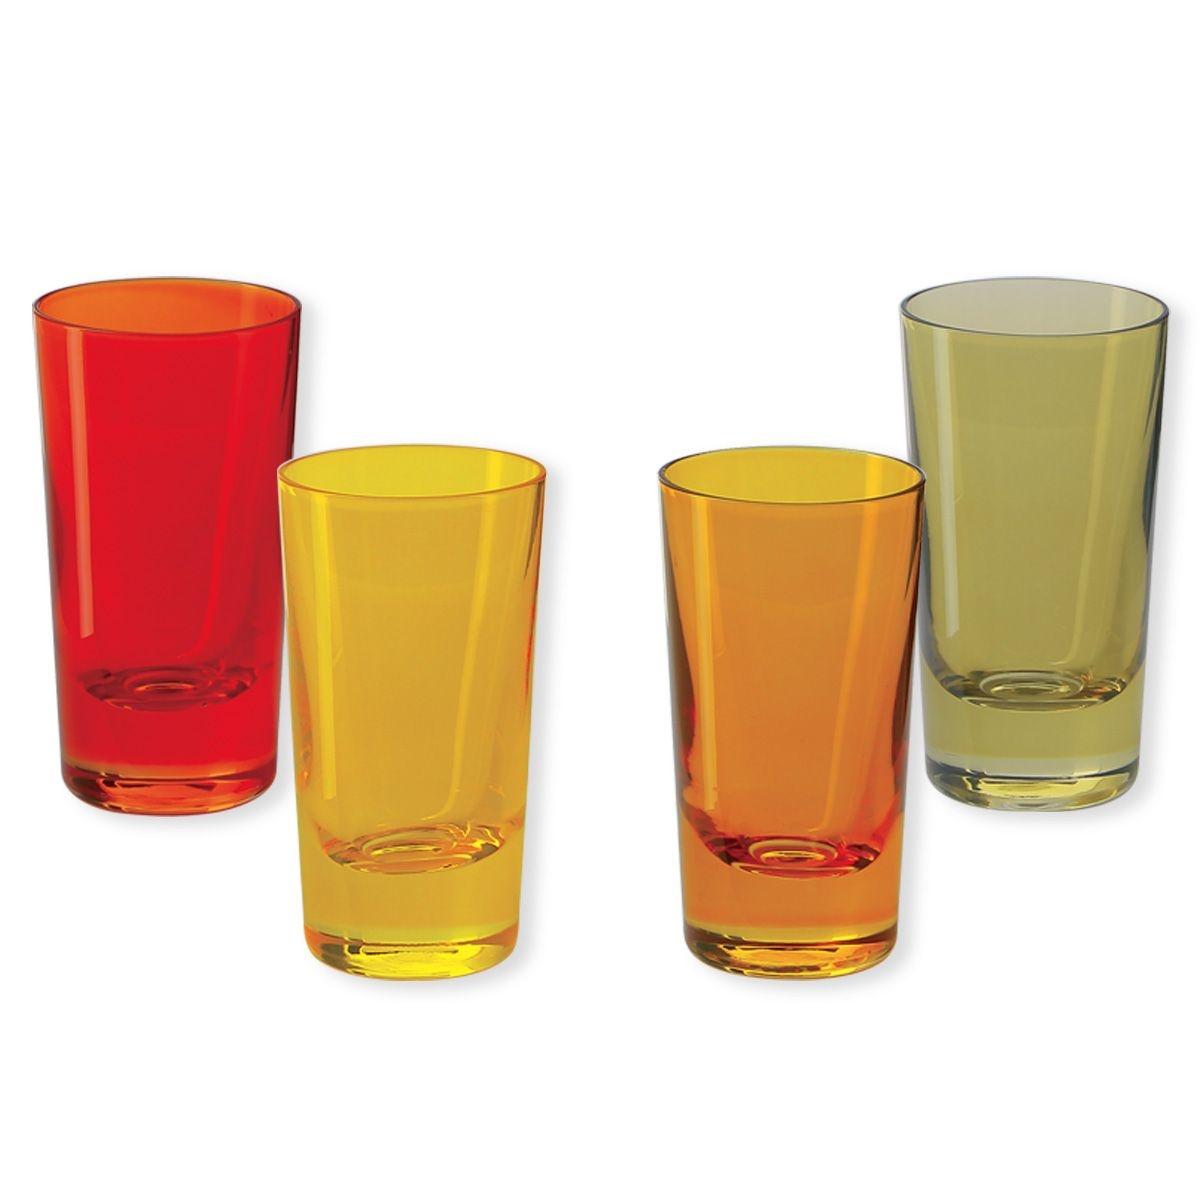 Verres à shooter en verre jaune 6cl - Lot de 4 - KADOR